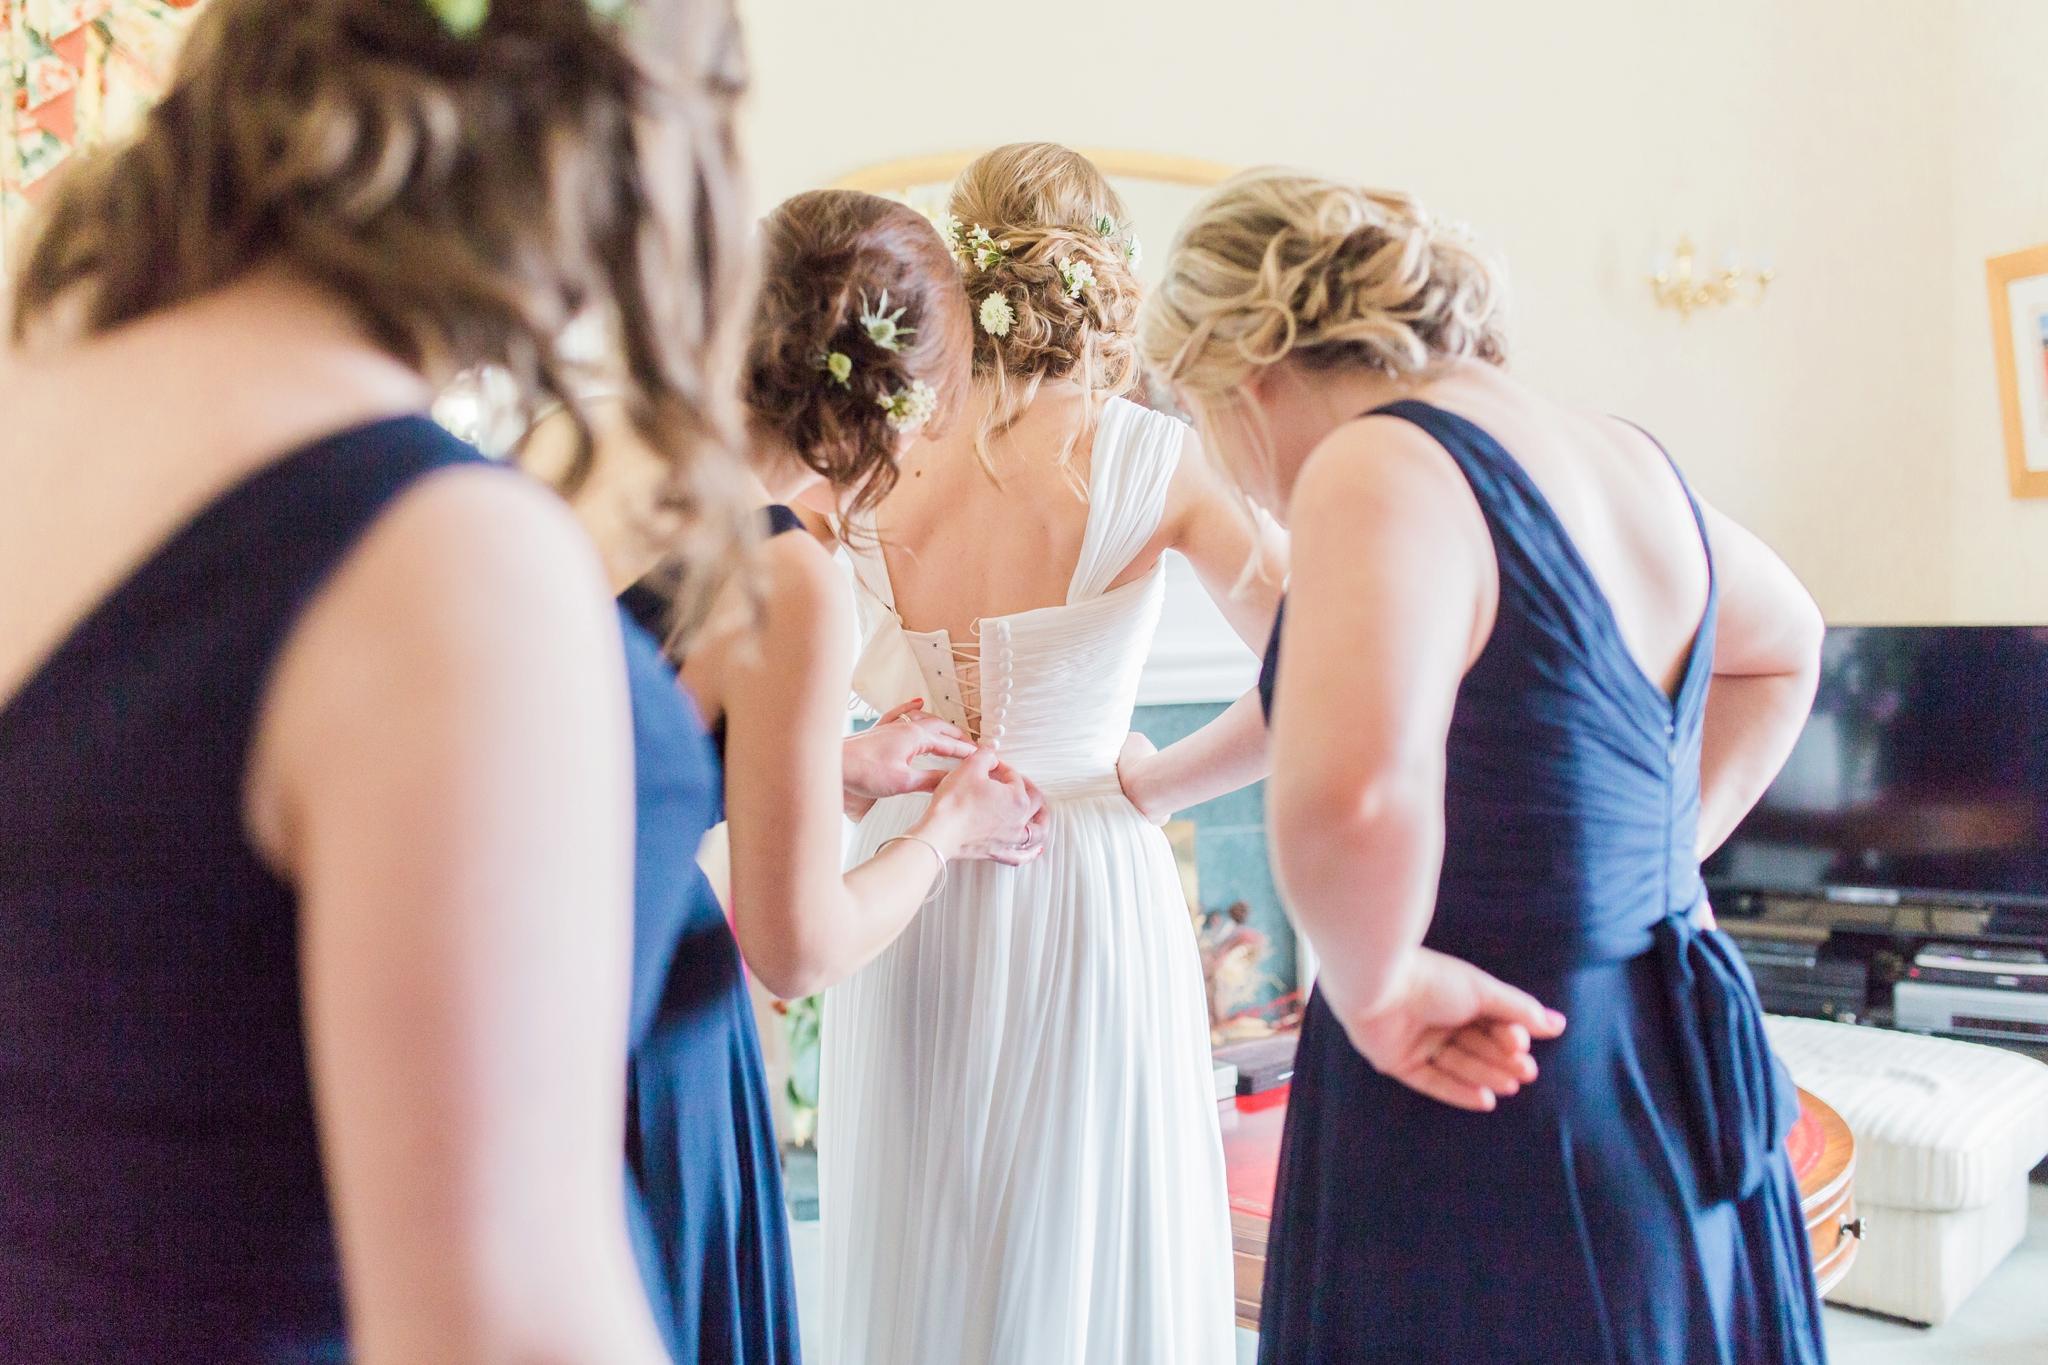 Suzanne_li_photography_kirknewton_wedding_0018.jpg